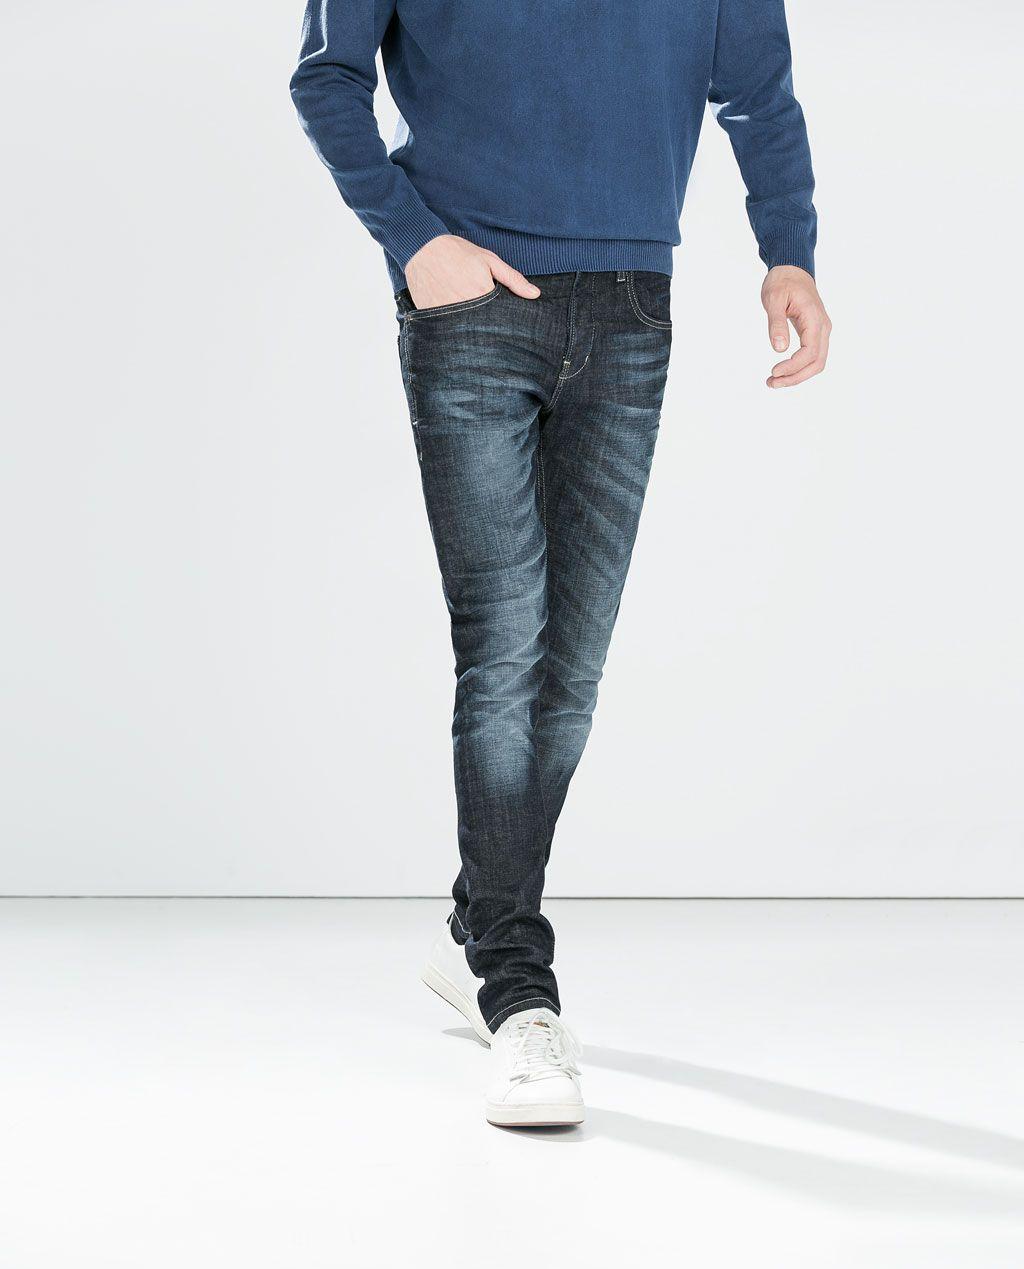 Adjustable Jeans Zara Waist Pinterest With Man qTwxa8gF